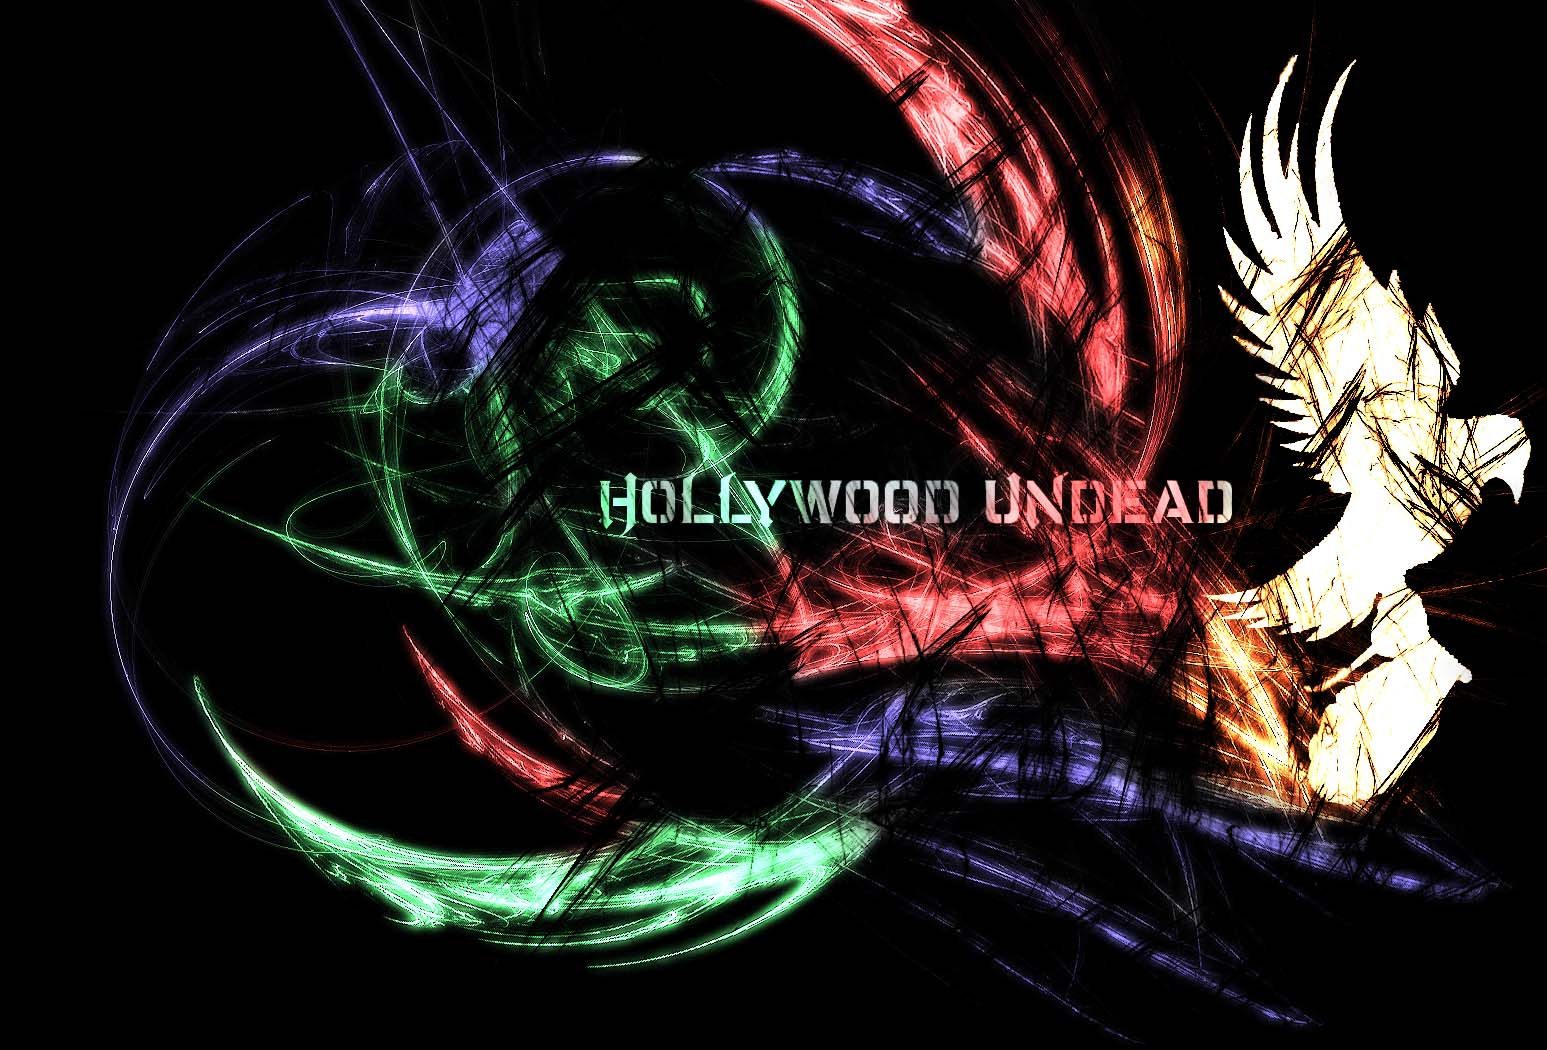 Hollywood Undead Wallpaper by Tado Kurosawa615 1547x1050